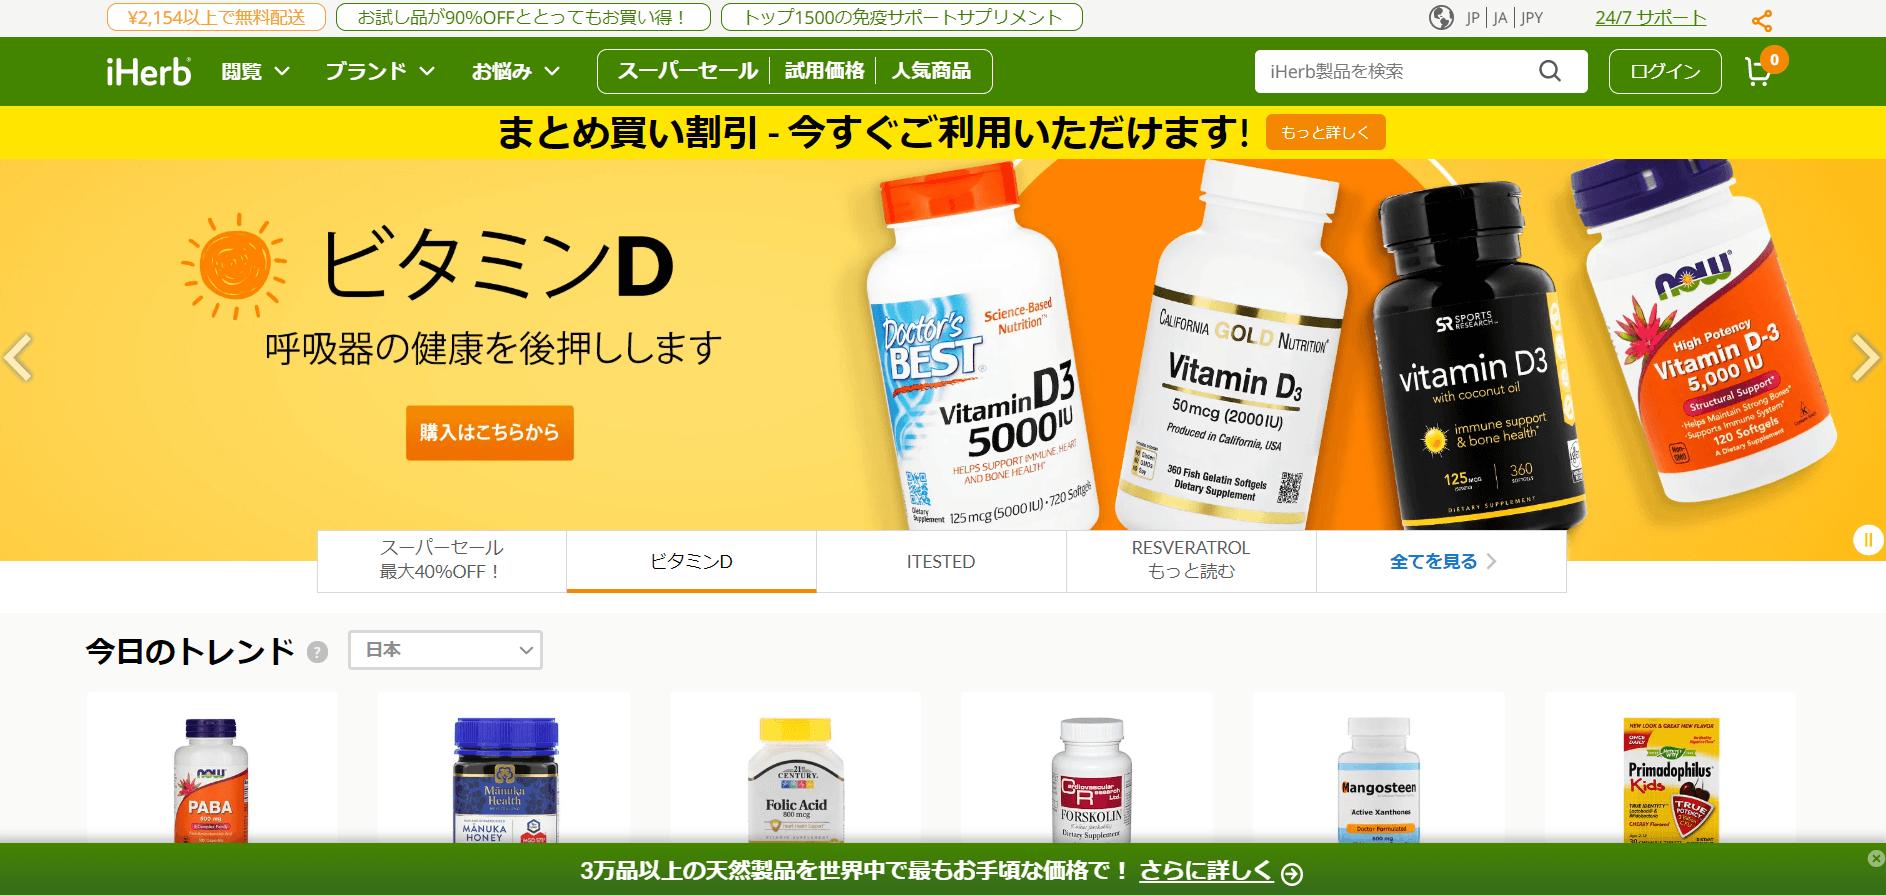 iherbの公式サイト